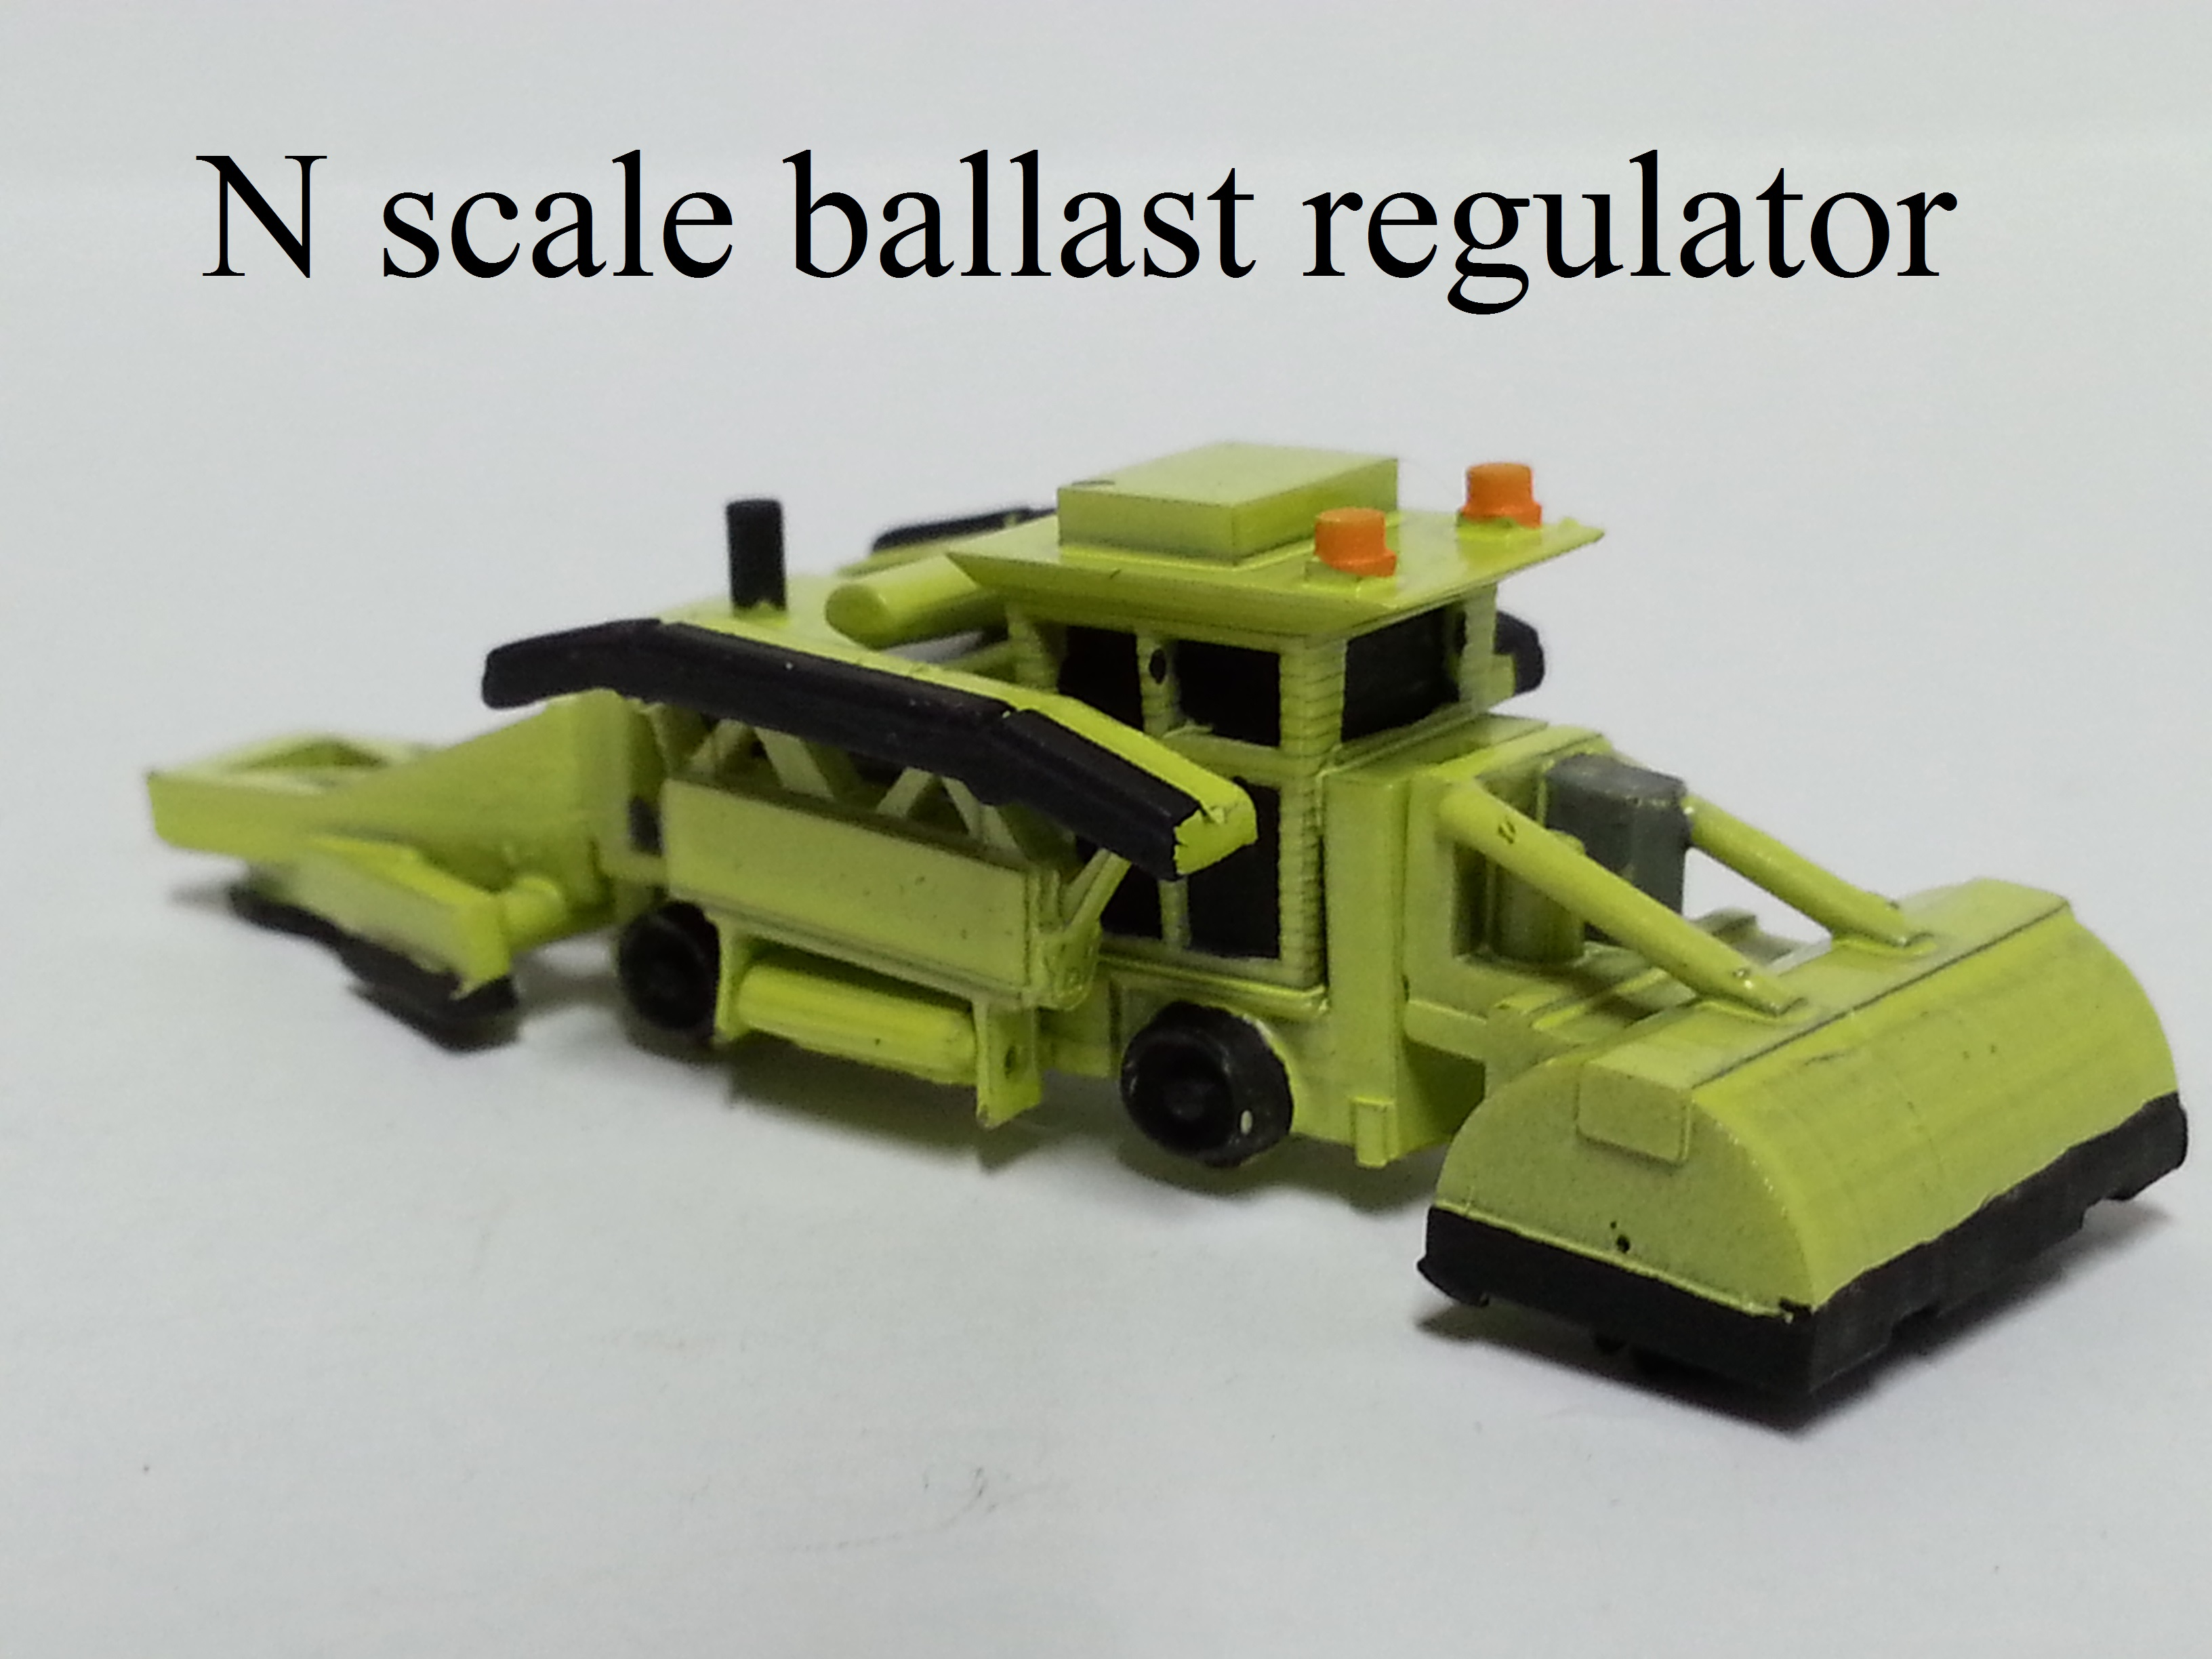 N scale ballast regulator